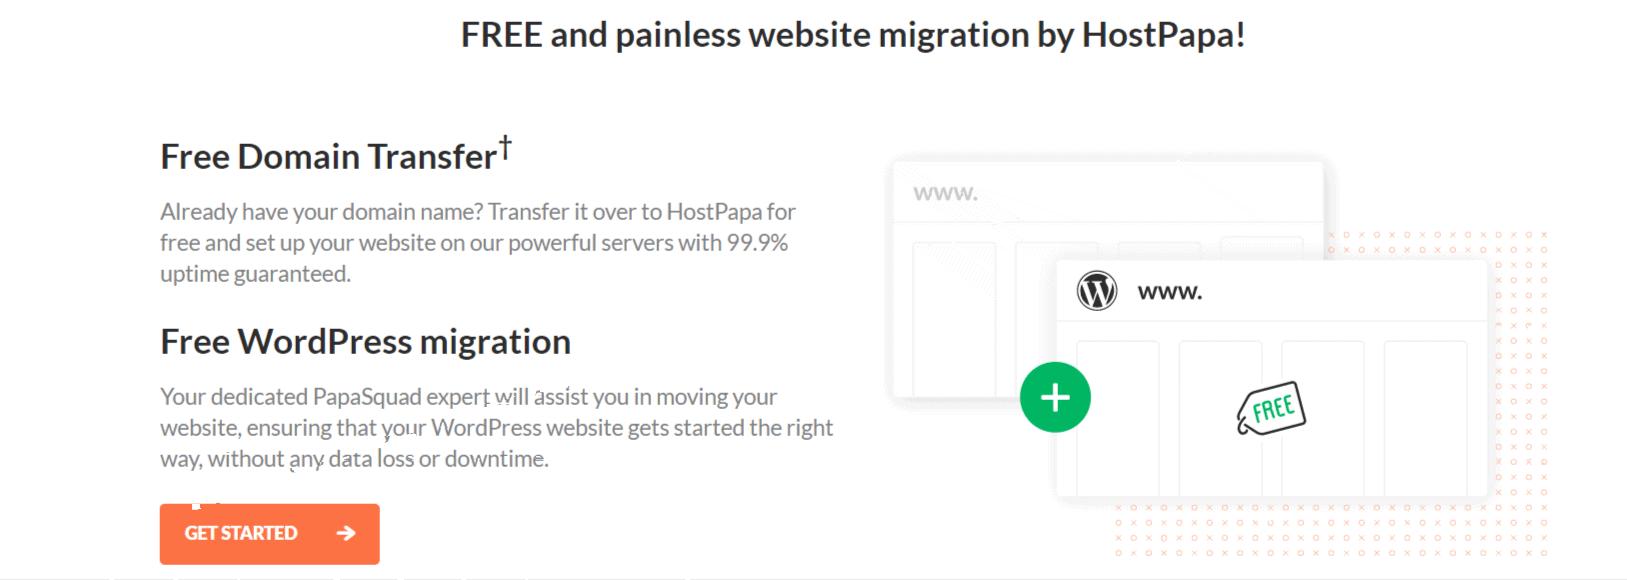 Migration HostPapa- Hostpapa Review